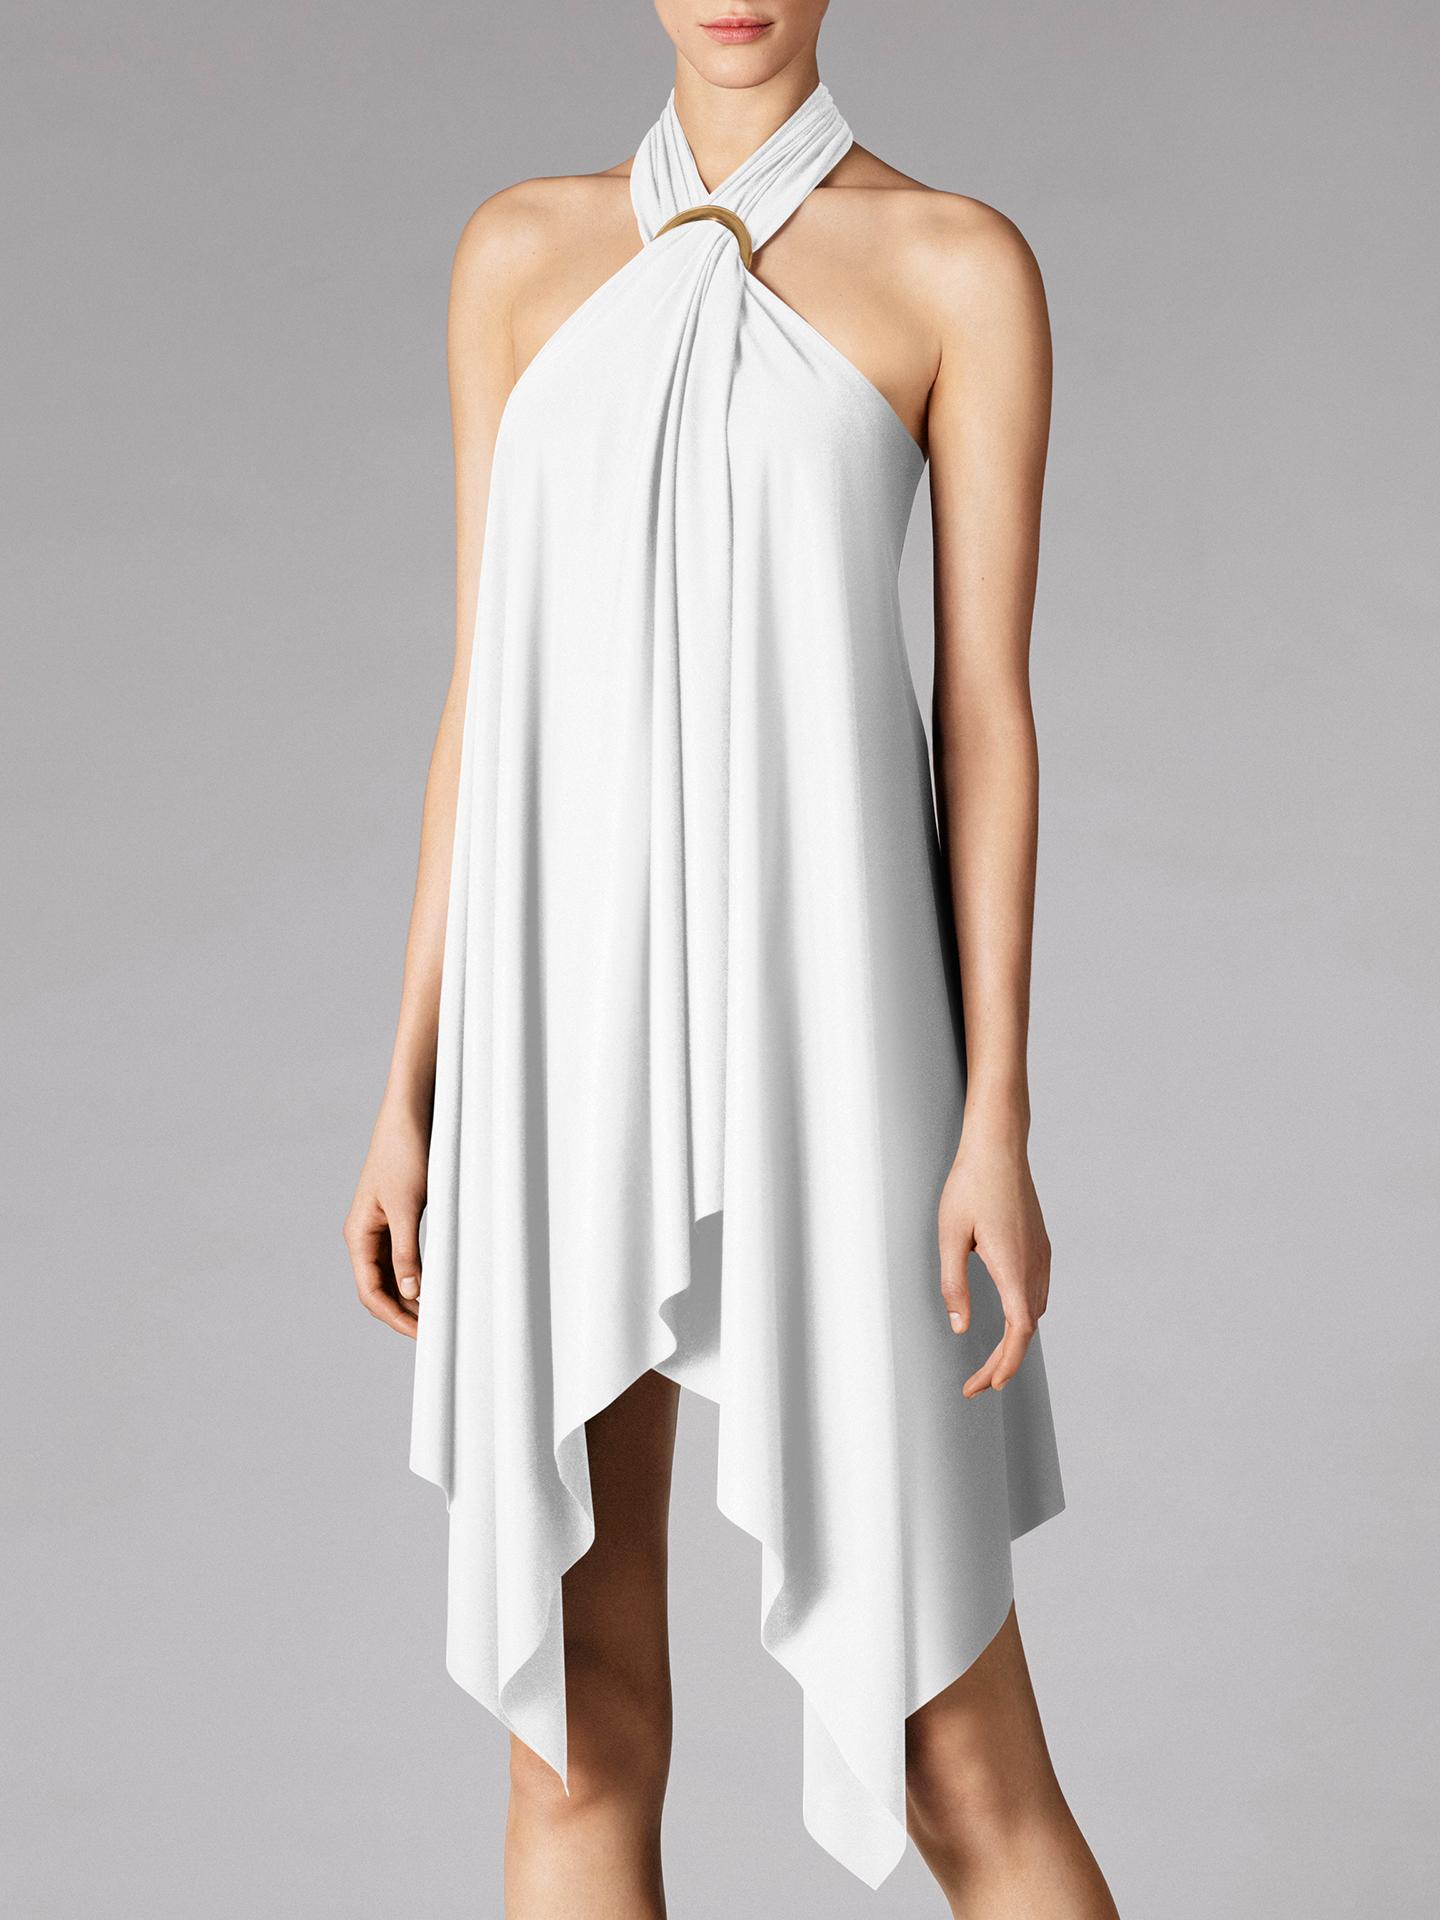 Pure Summer Dress - 1001 - M